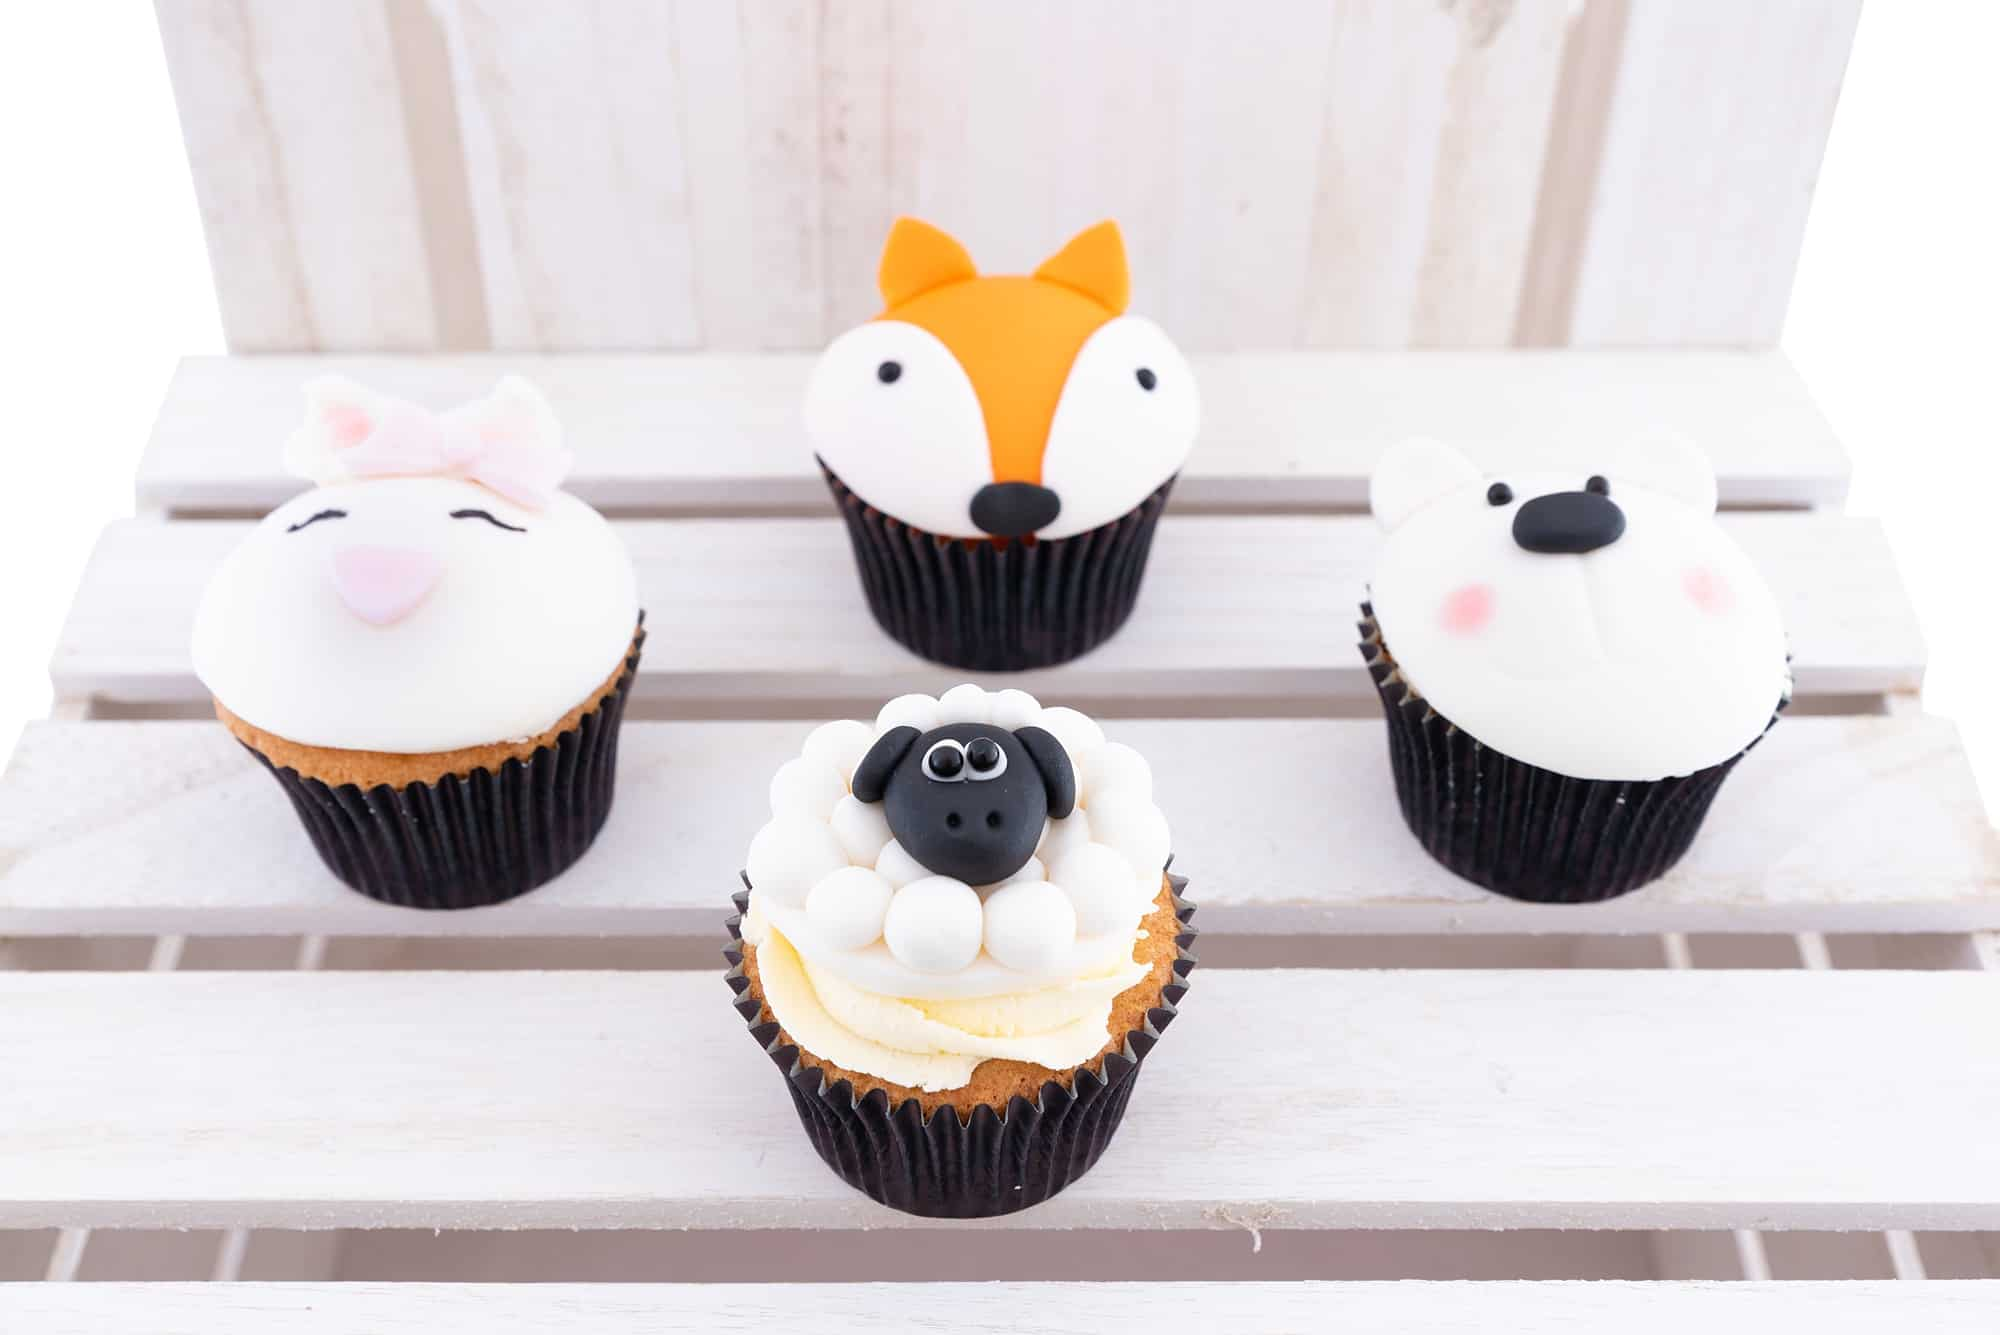 www.blossombakery.co.uk products i have photographed - animal cakes